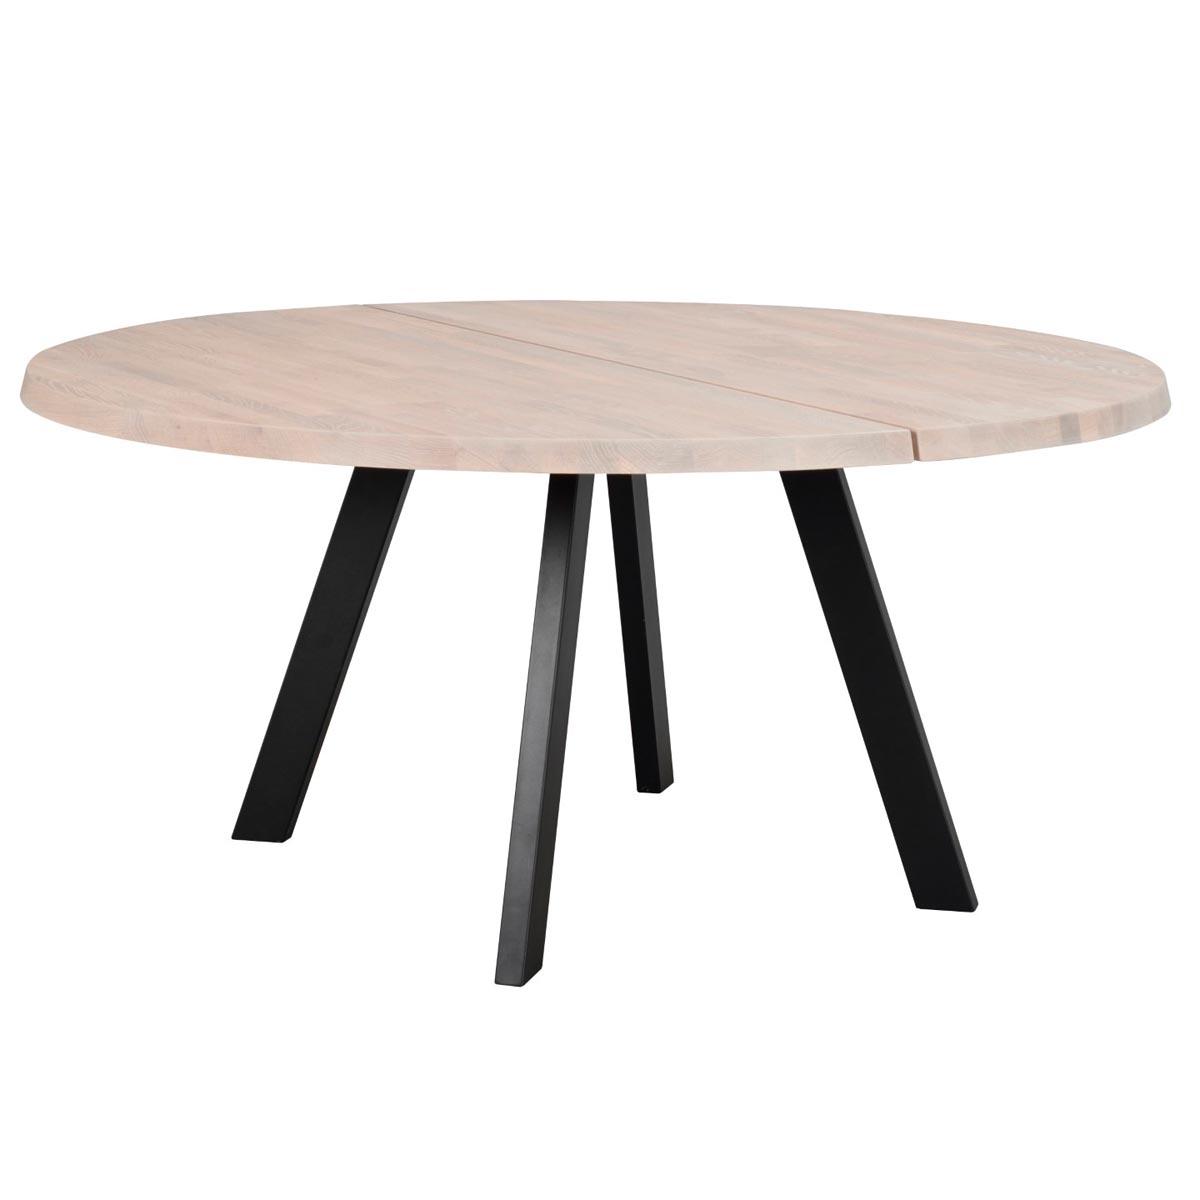 Fred-matbord-runt-160-vitpigm-ek-svart